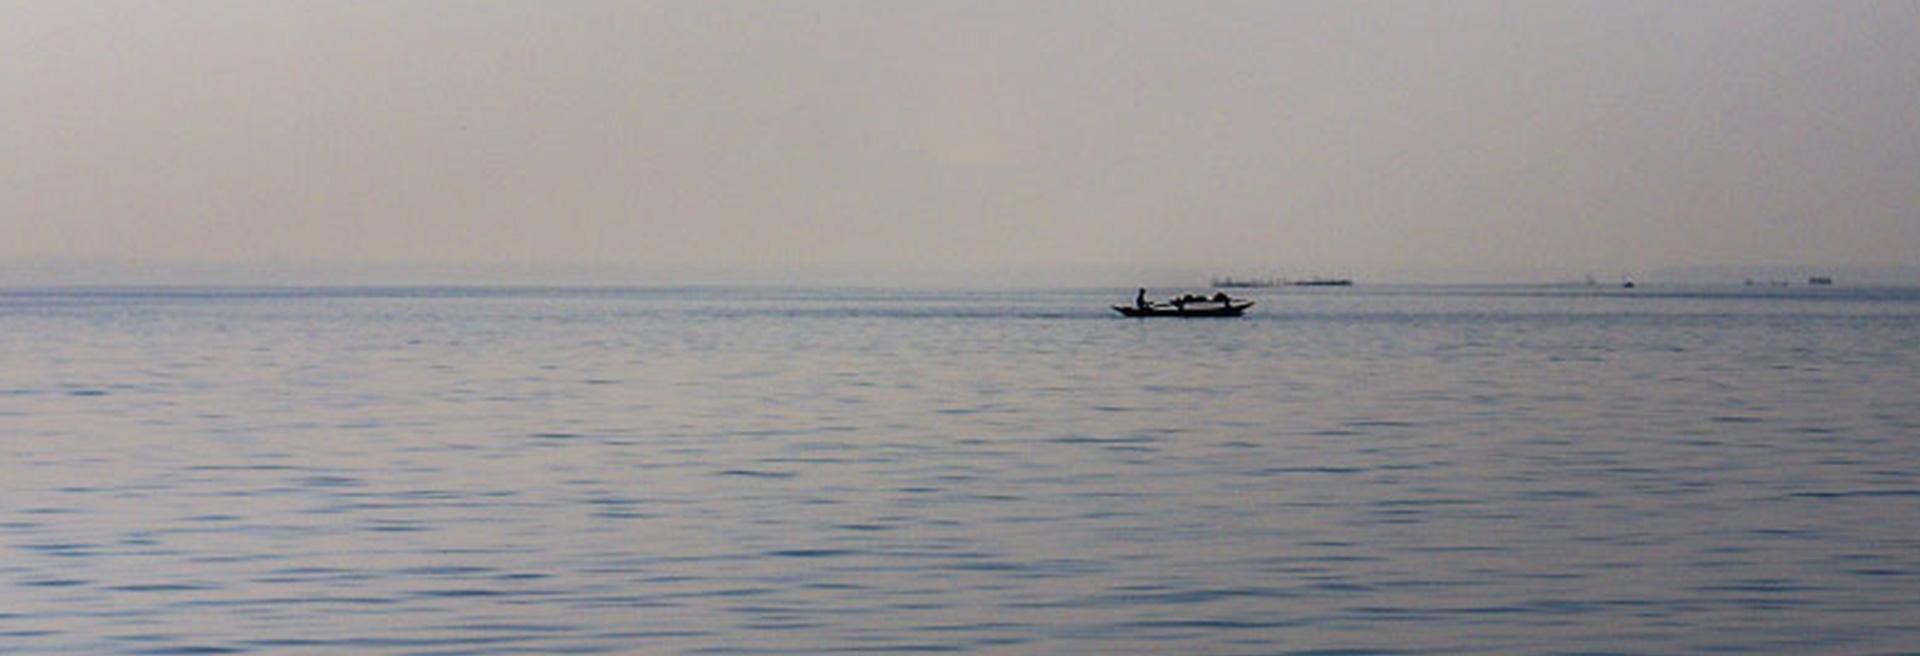 boat cruising along the beach